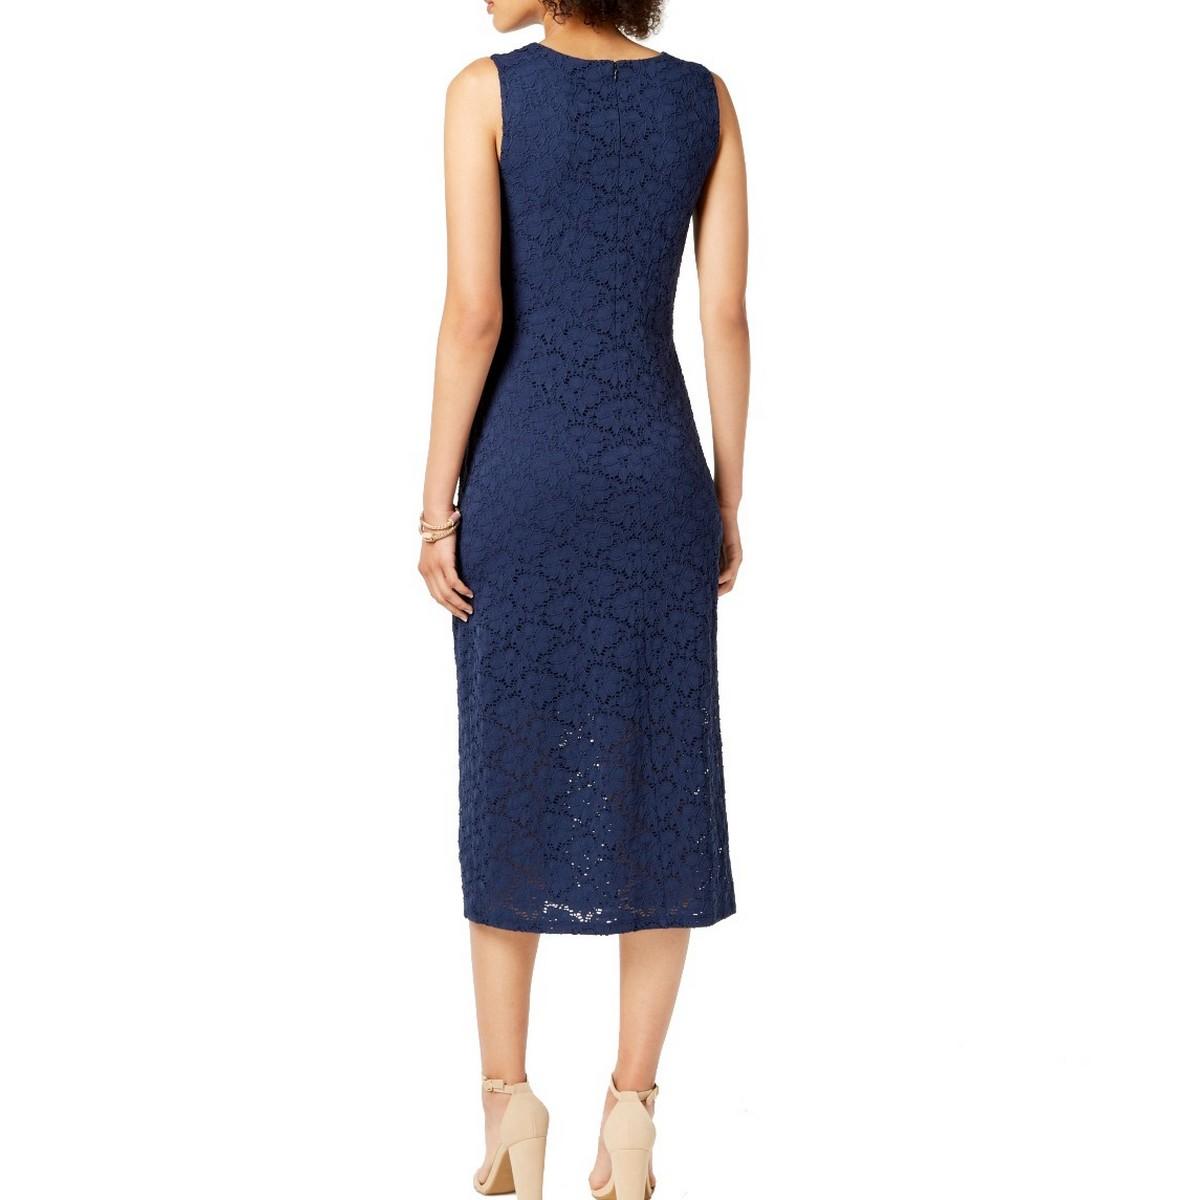 ALFANI-NEW-Women-039-s-Sleeveless-Lace-Midi-Dress-TEDO thumbnail 7